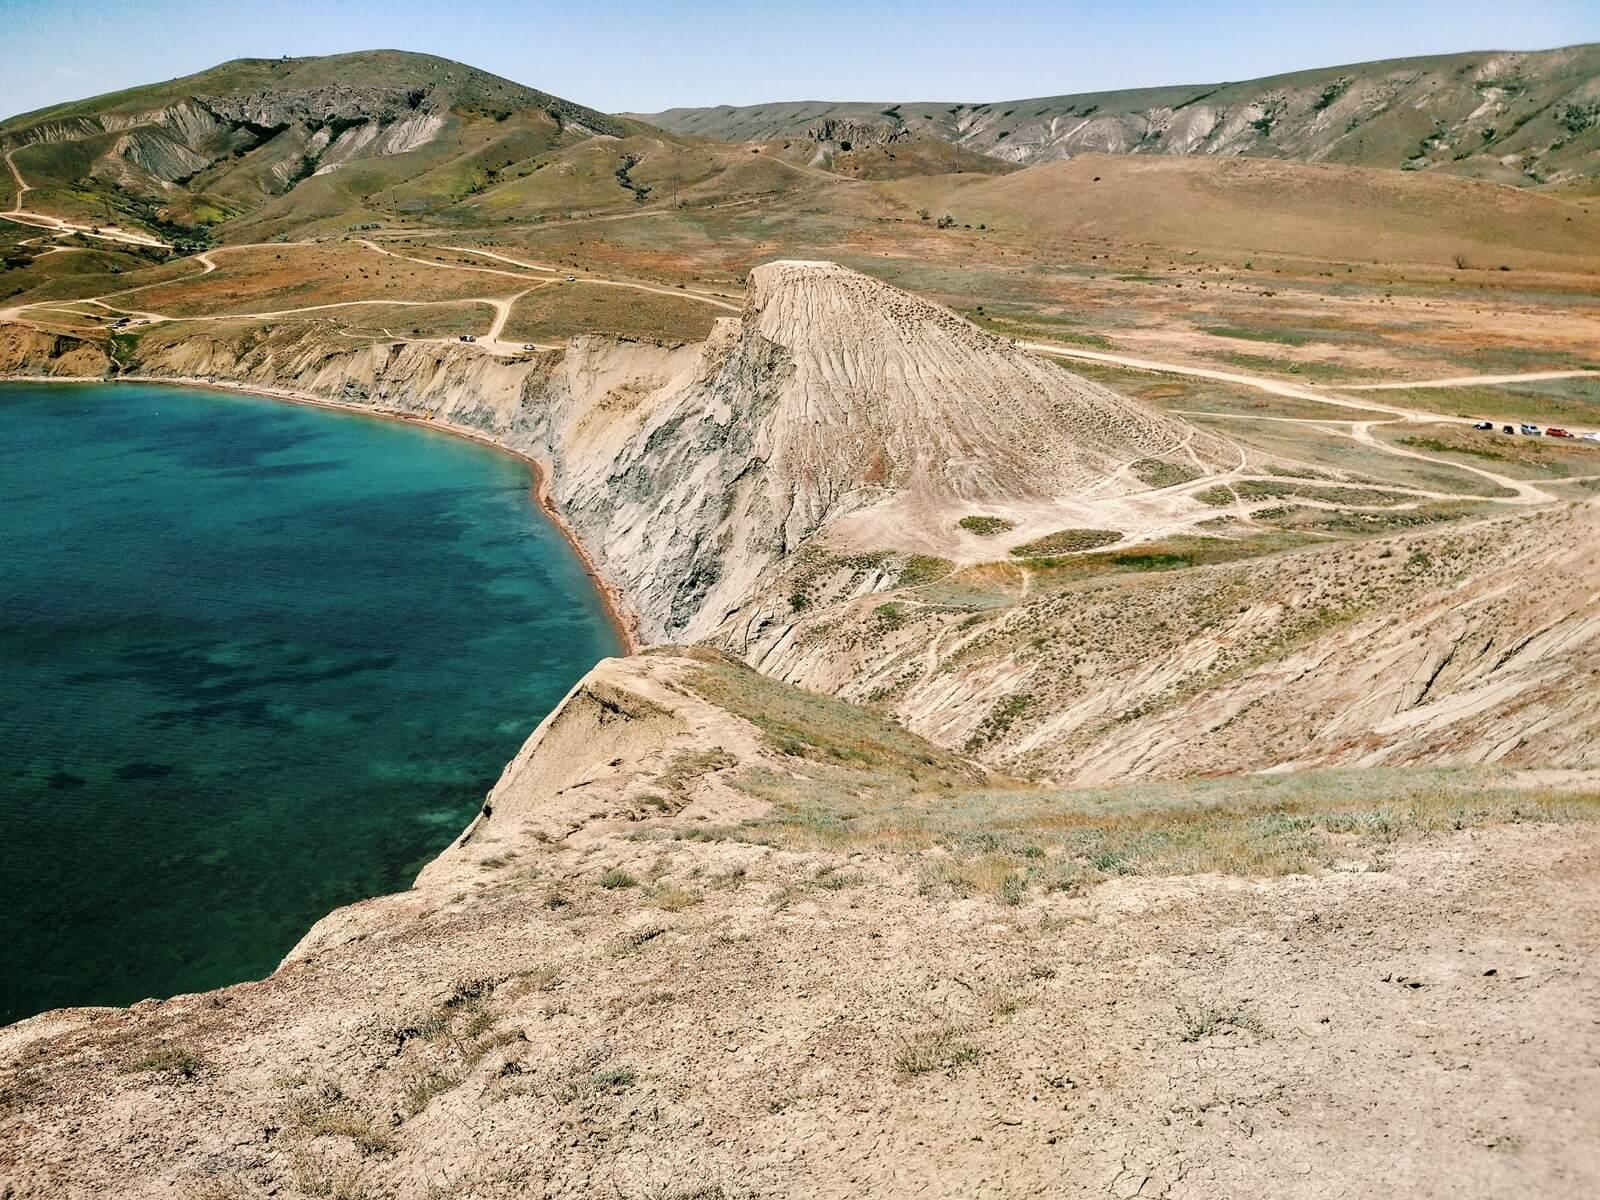 Красиво фото мыса Хамелеон (Крым)